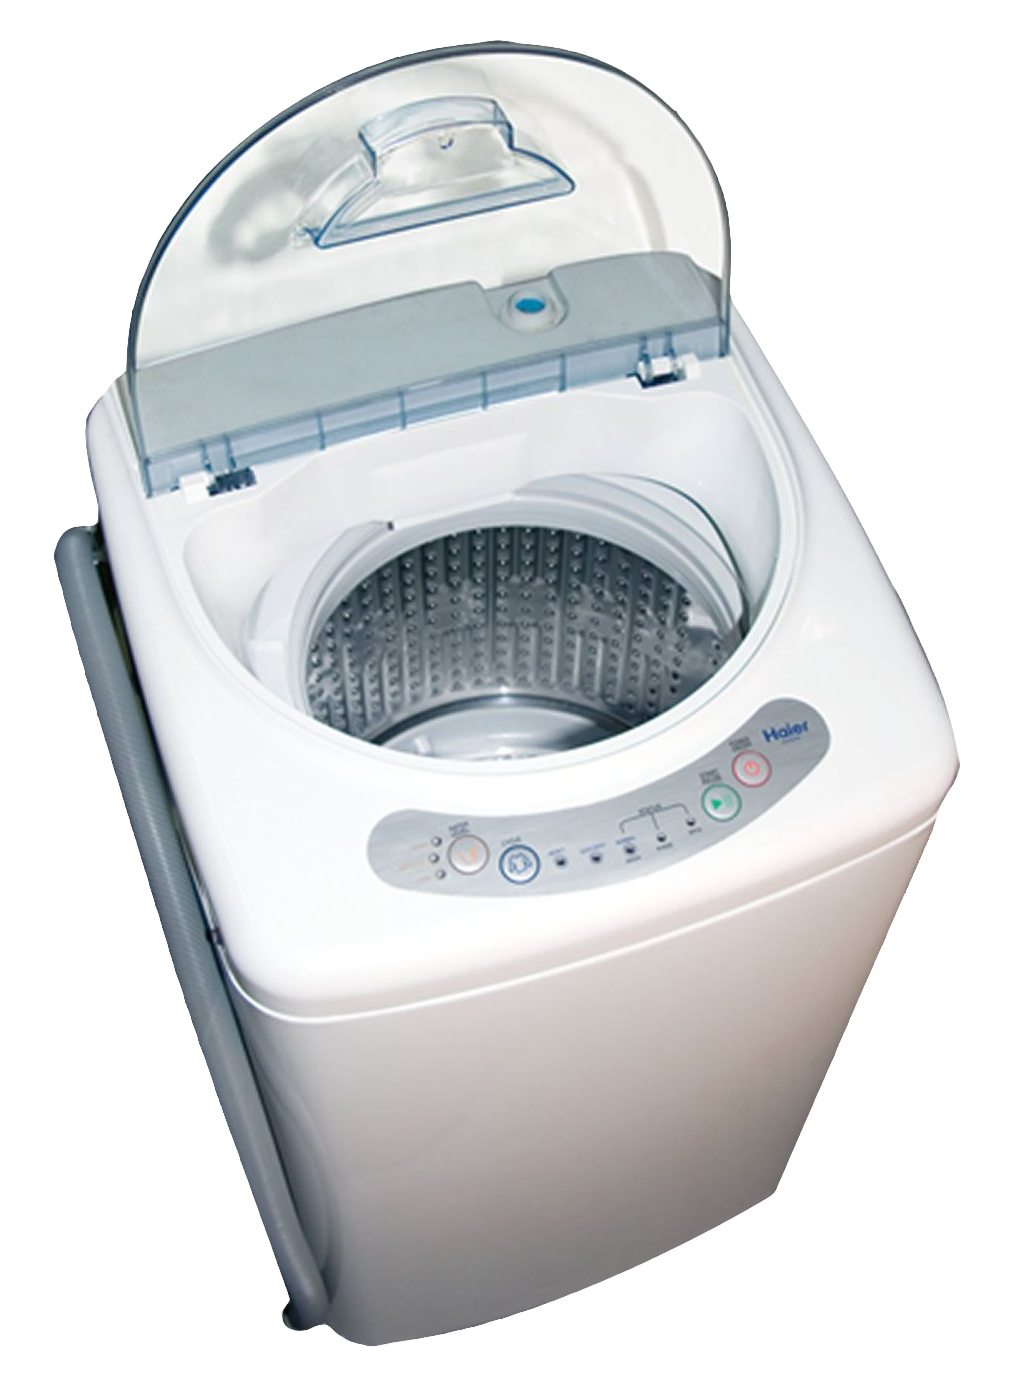 Washing Machine Top View